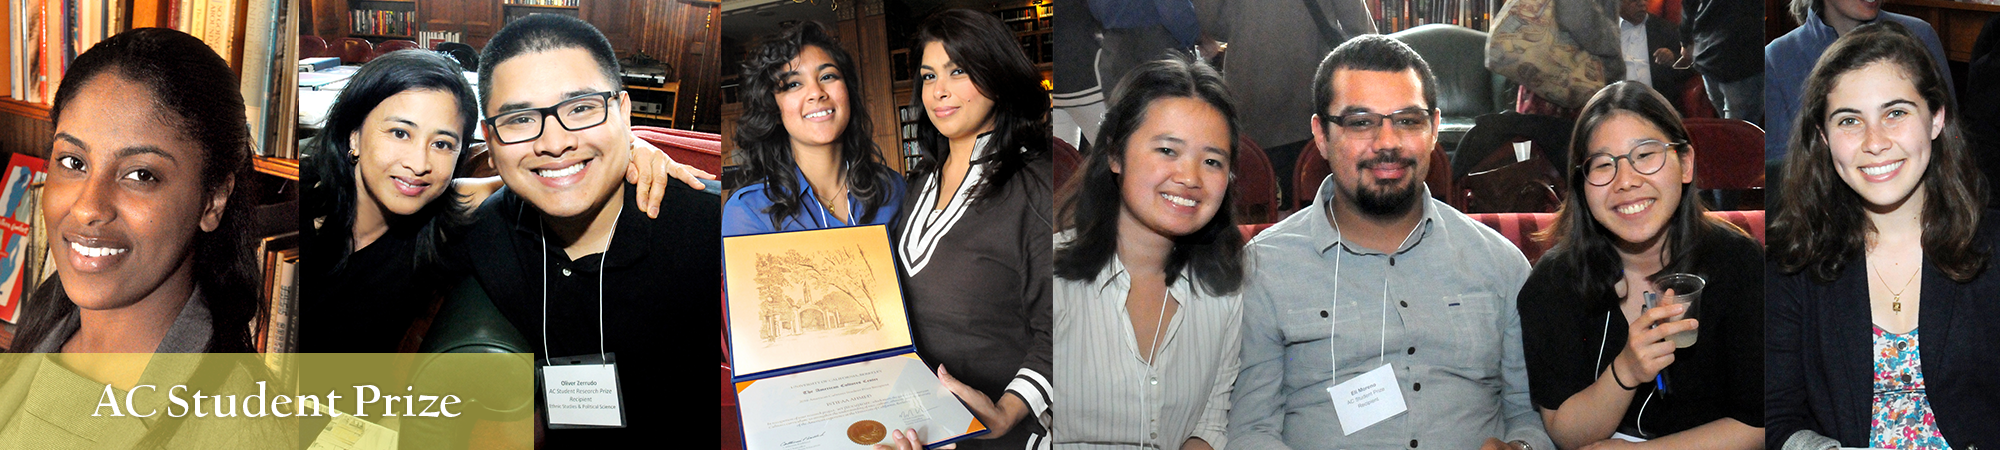 Student Prize recipients